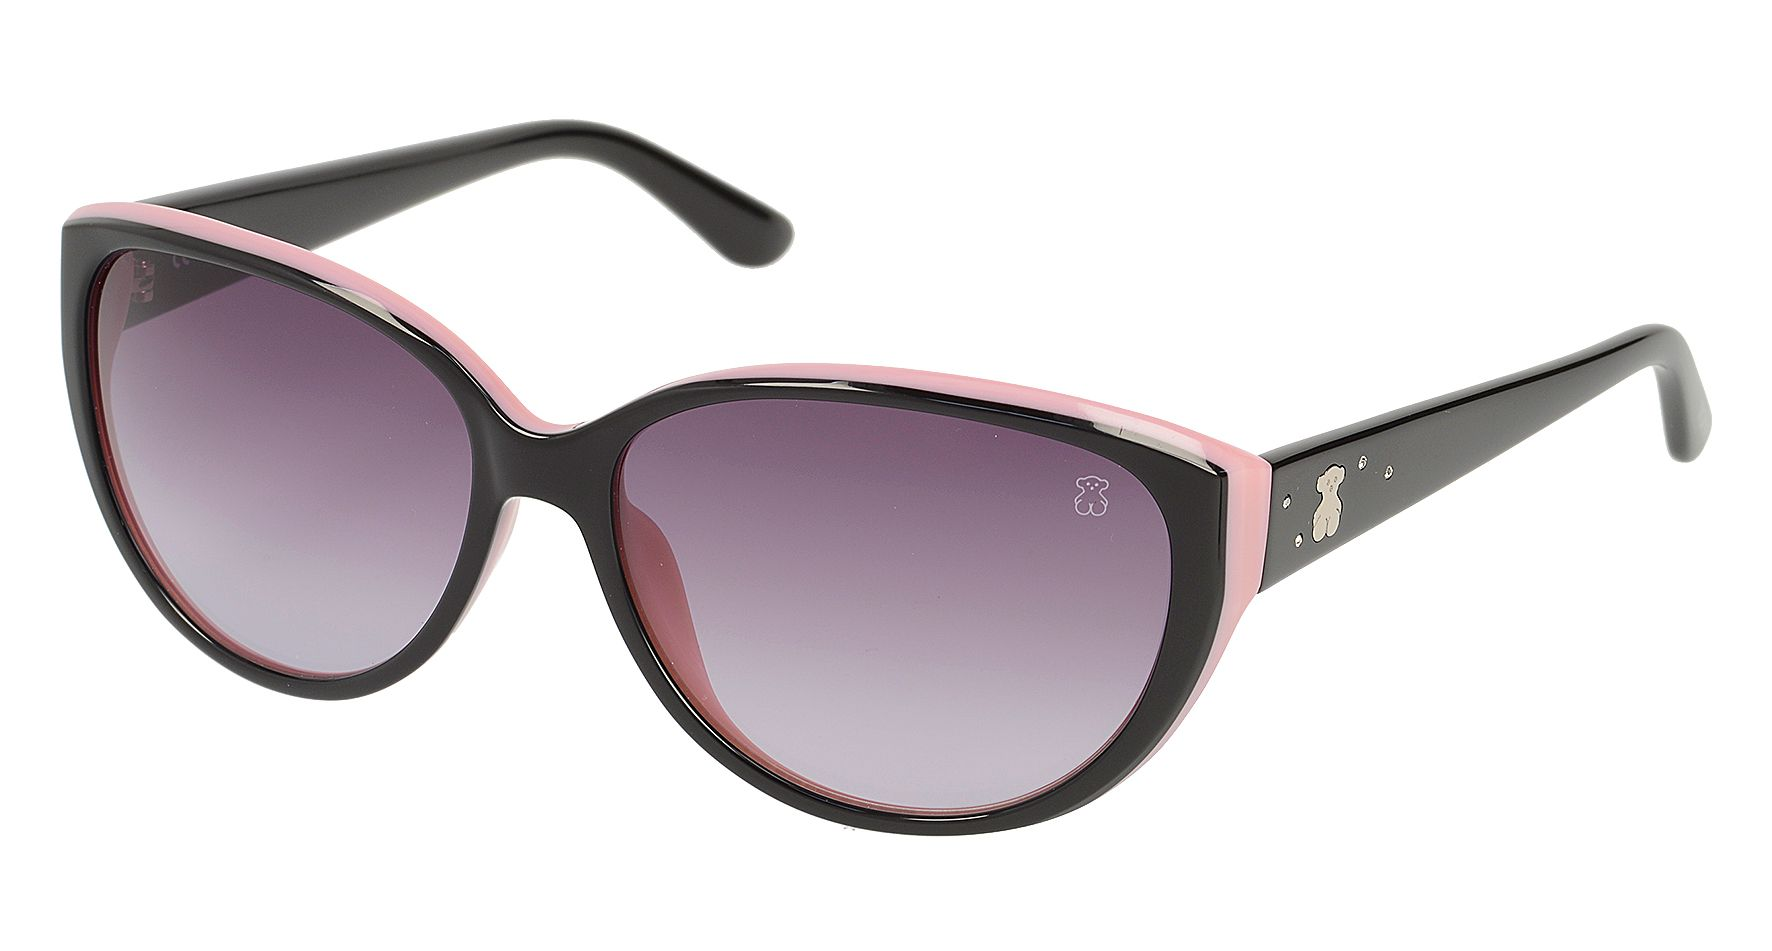 4db26c33c8 TOUS Strass Round sunglasses | Lentes | Pinterest | Round sunglasses ...